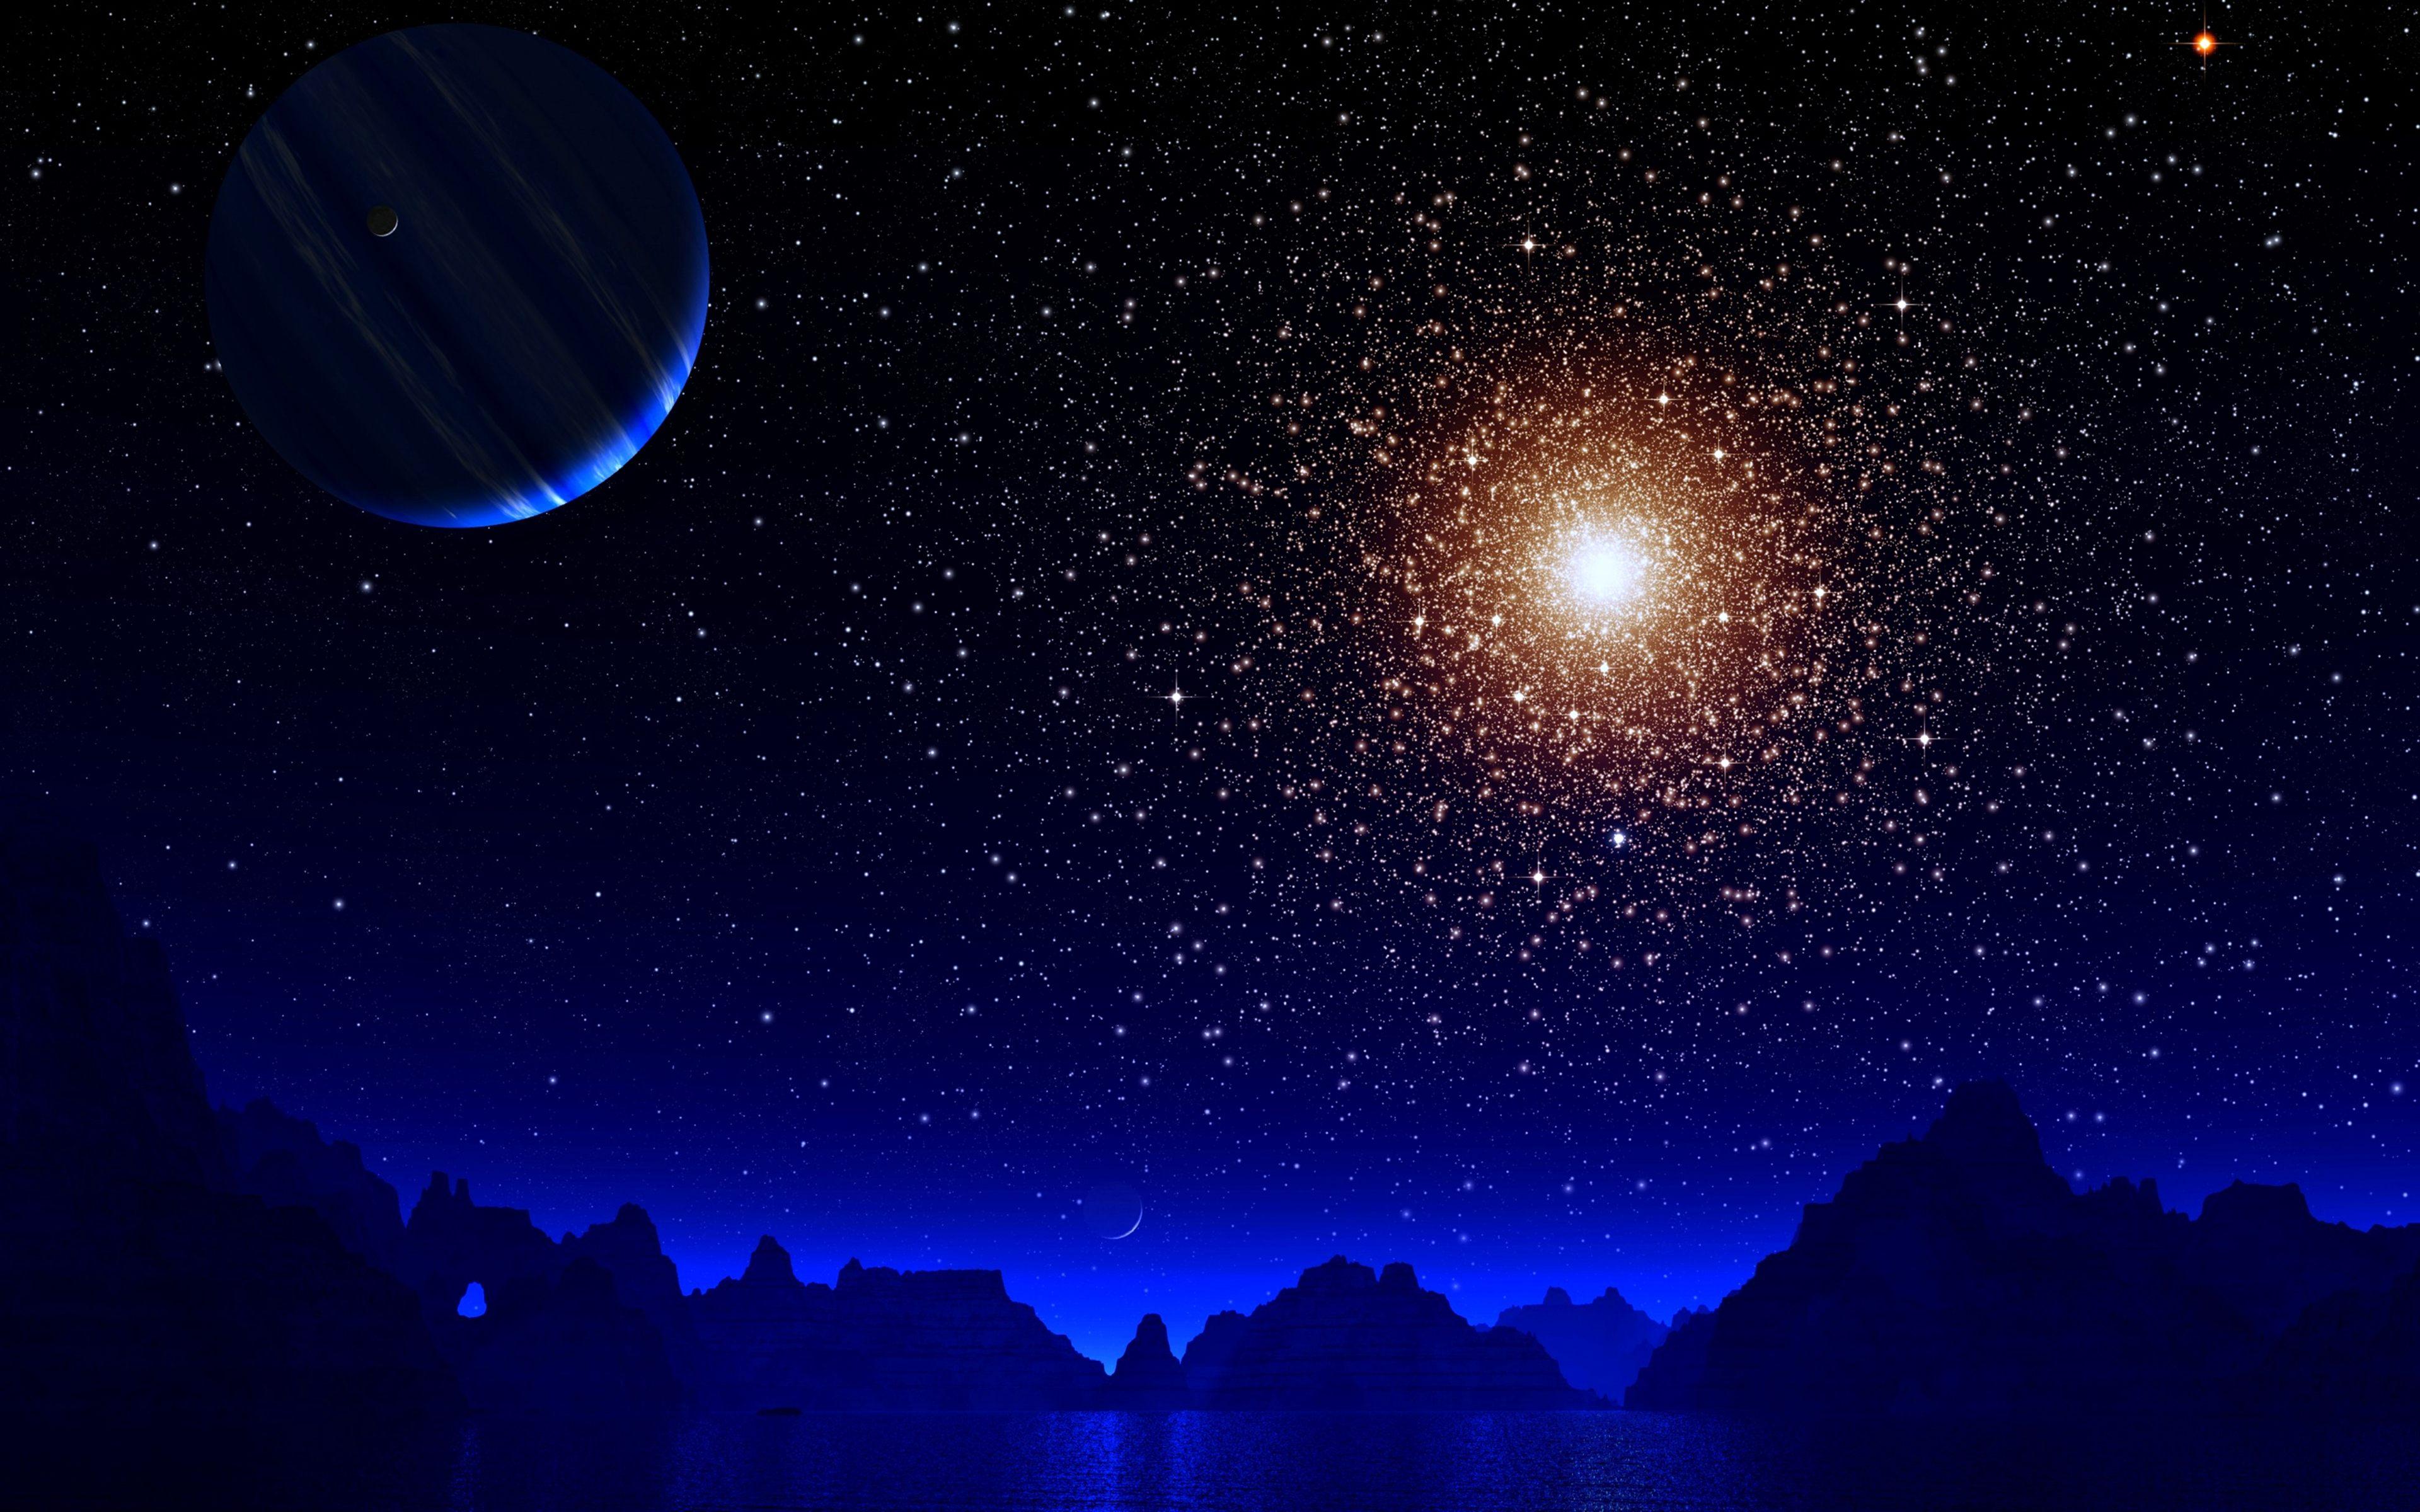 Blue night moon stars earth 4k hd digital universe 4k for Night sky wallpaper 4k